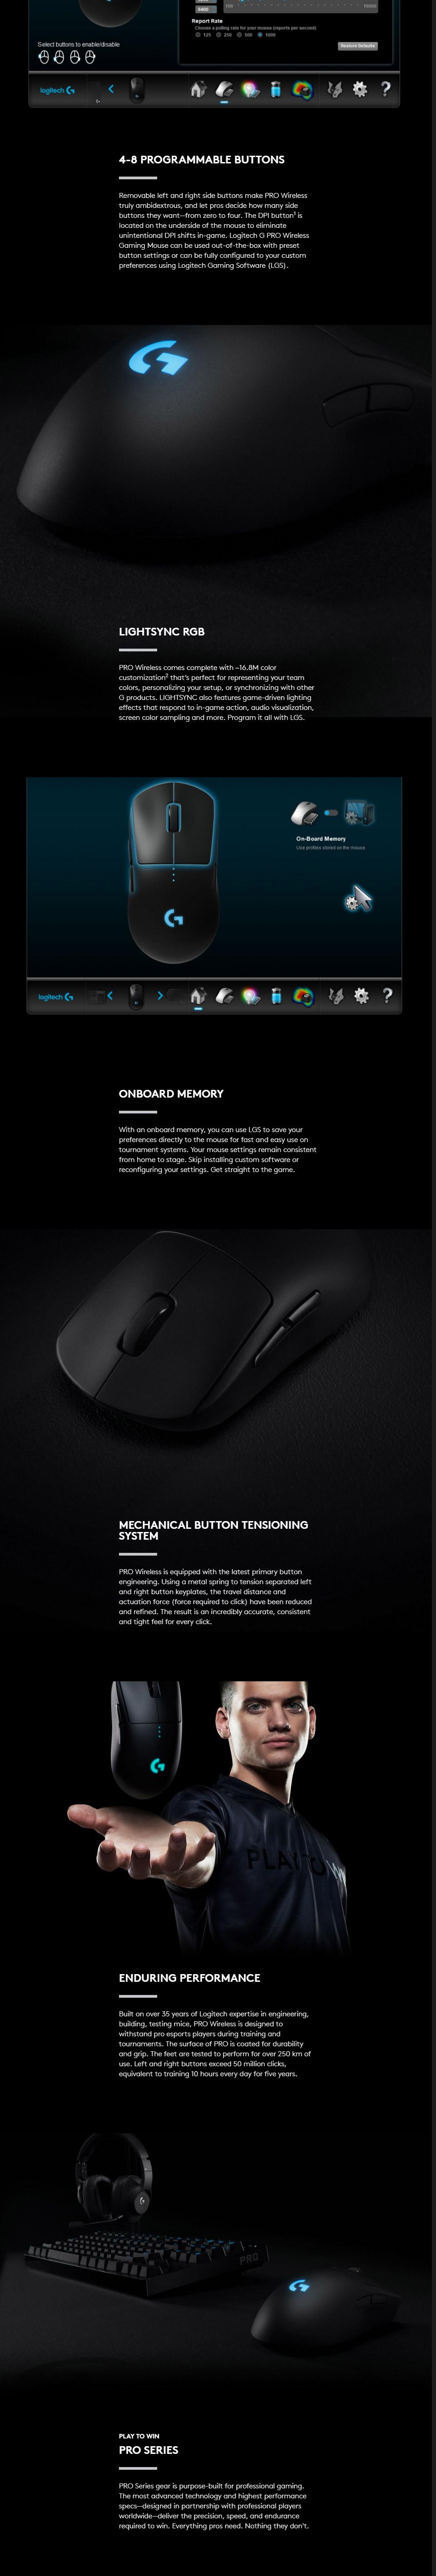 Logitech G Pro Wireless Gaming Mouse with 16K Hero Sensor